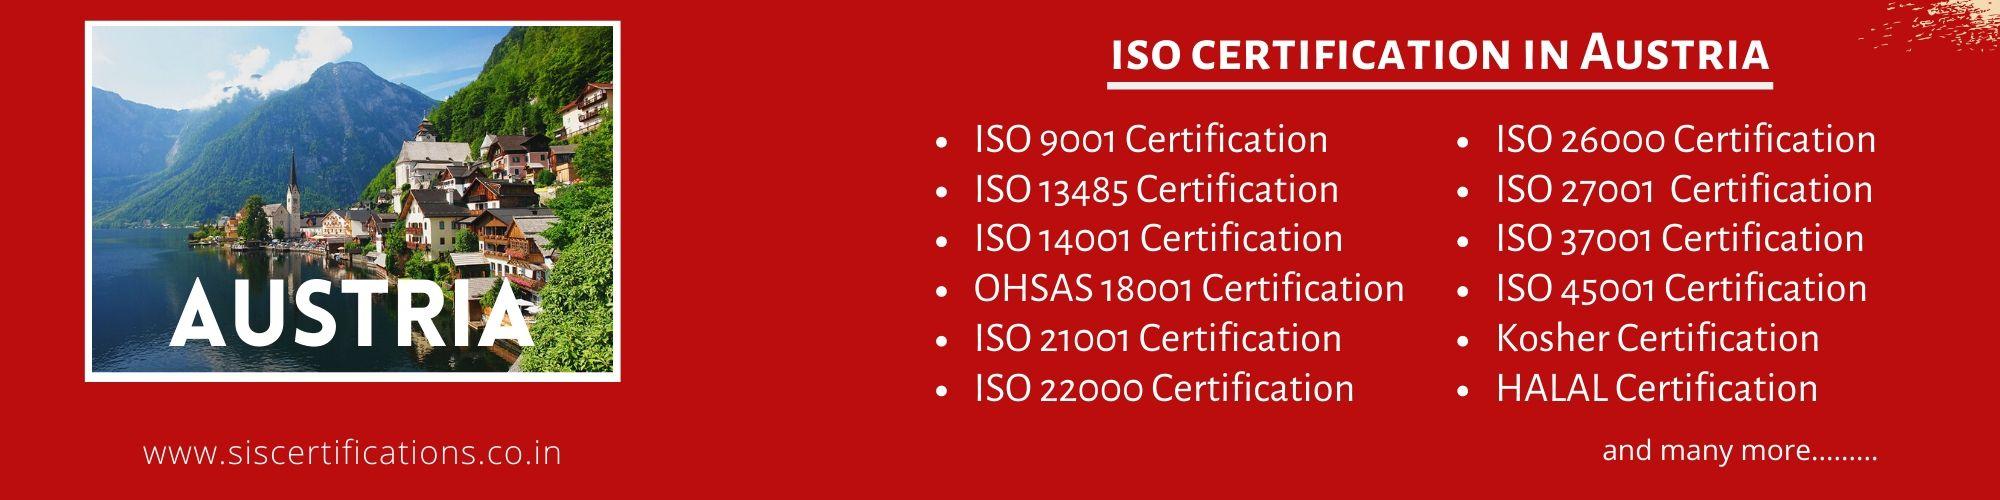 ISO Certification in Austria